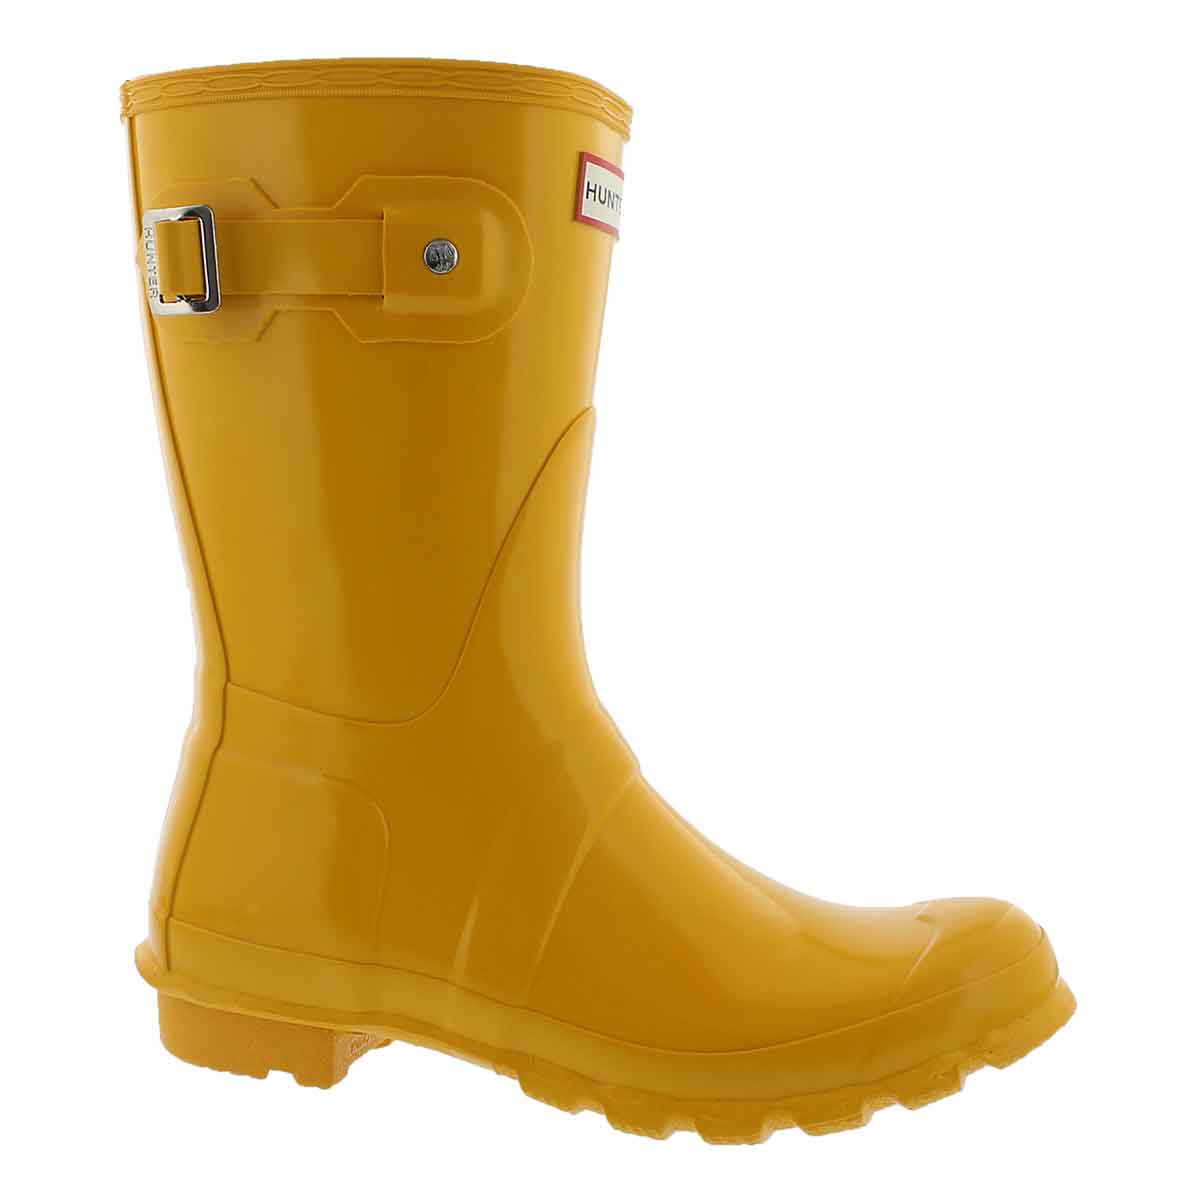 Women's ORIGINAL SHORT GLOSS yellow rain boots